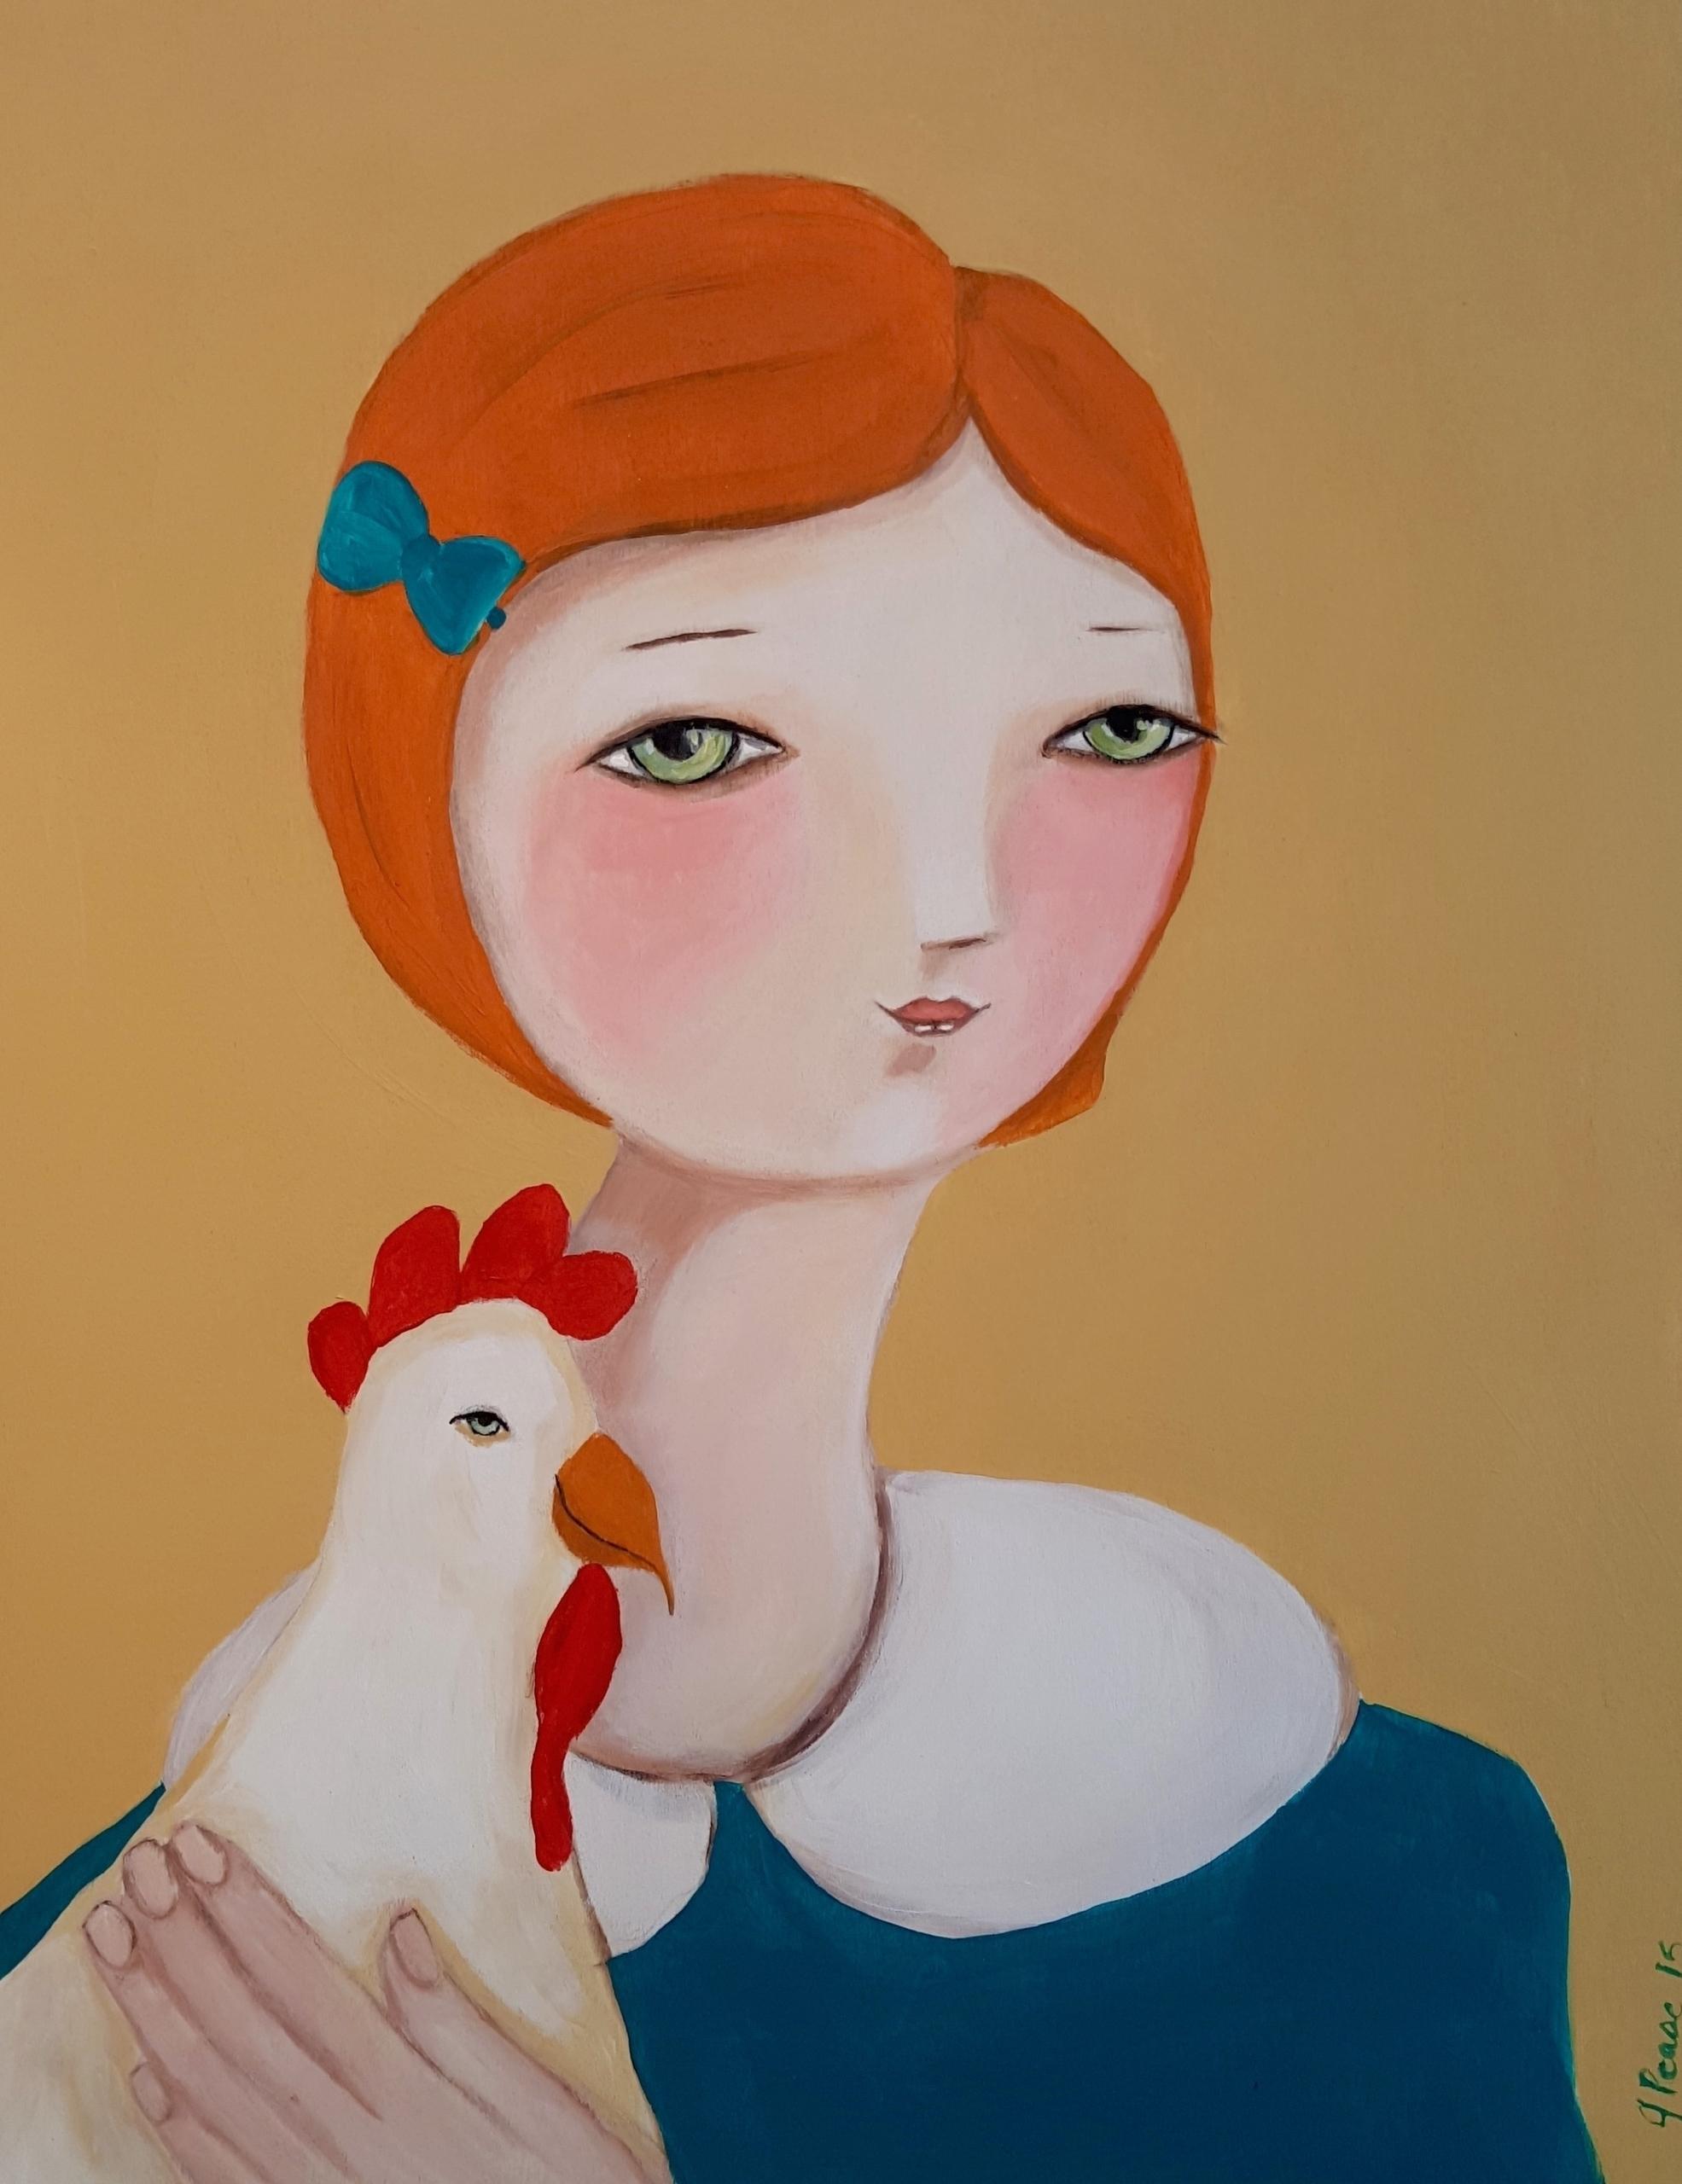 chickengirl - jenniferpease | ello